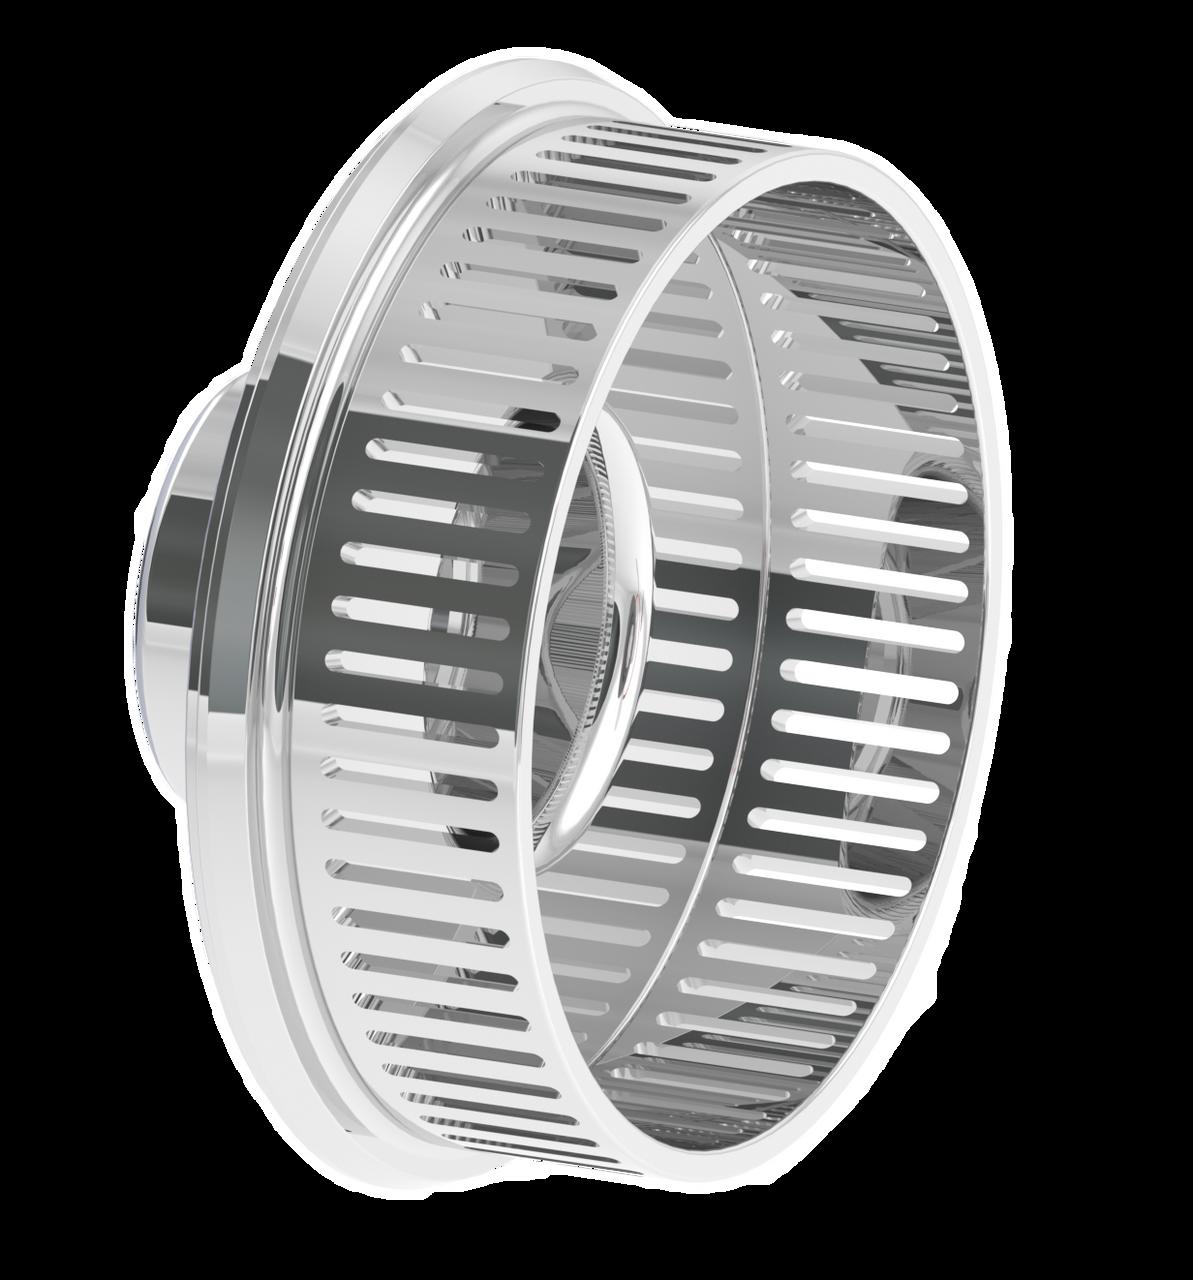 QIM SERIES centrifugal mixers